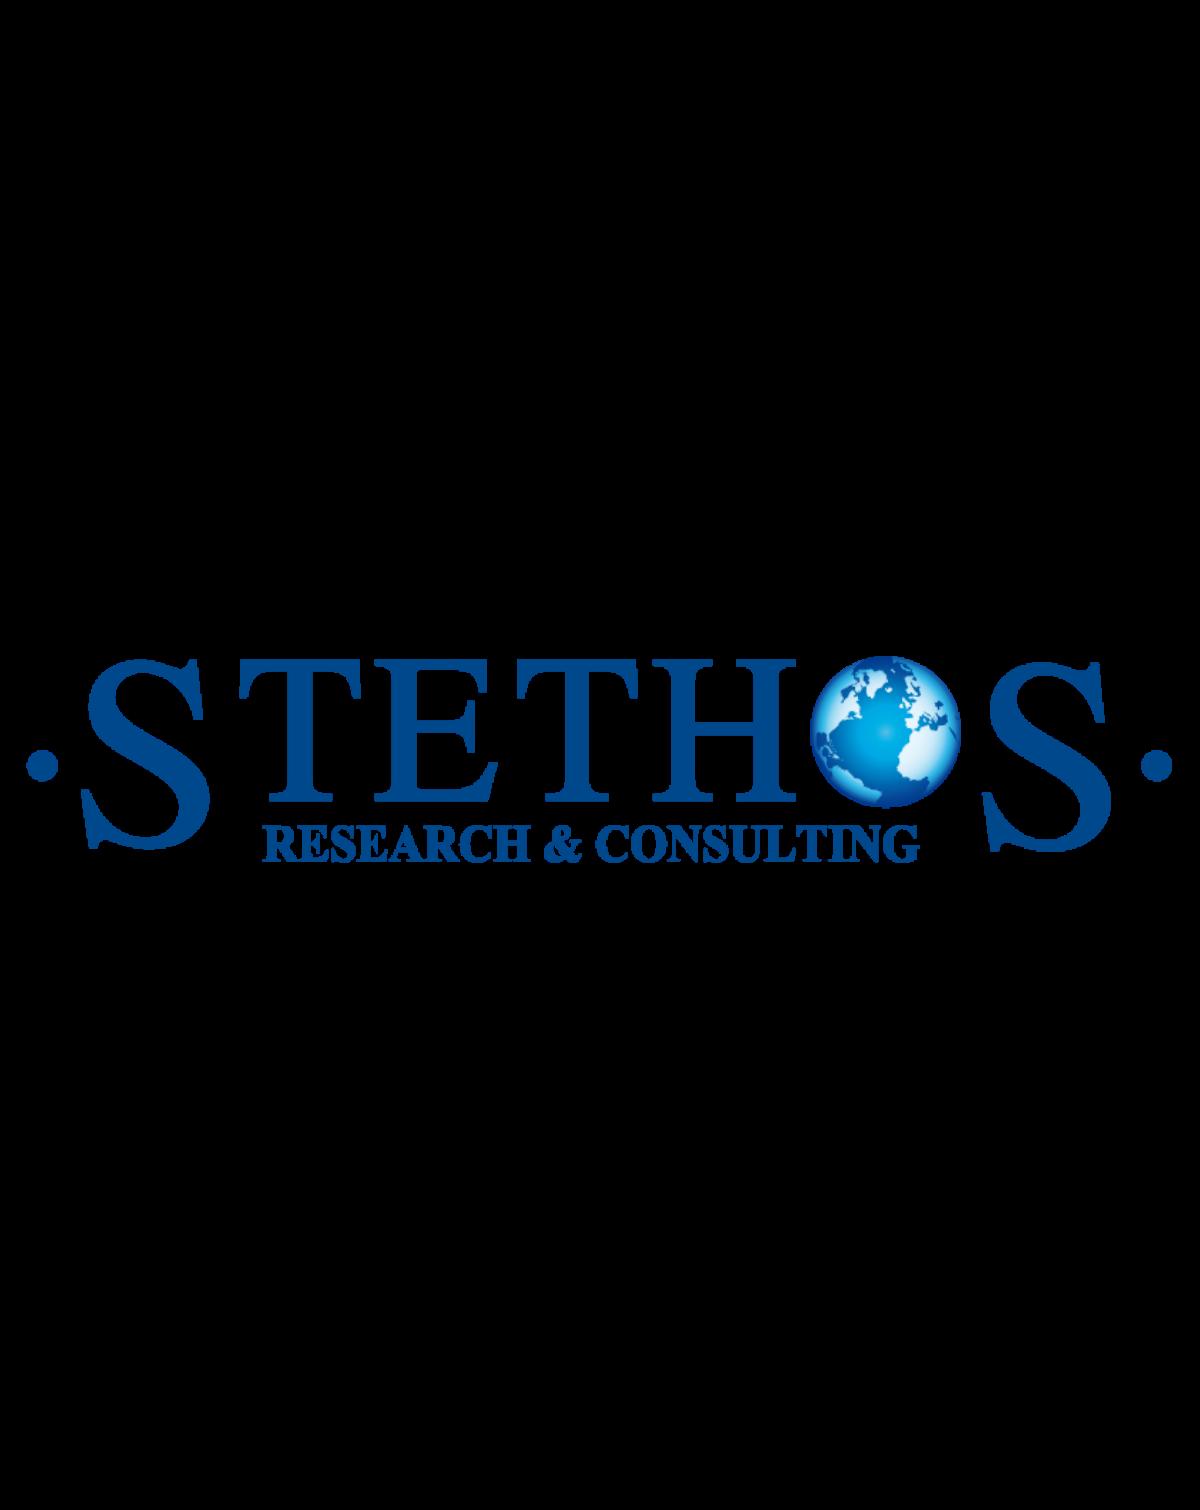 stethos anteprima+storia